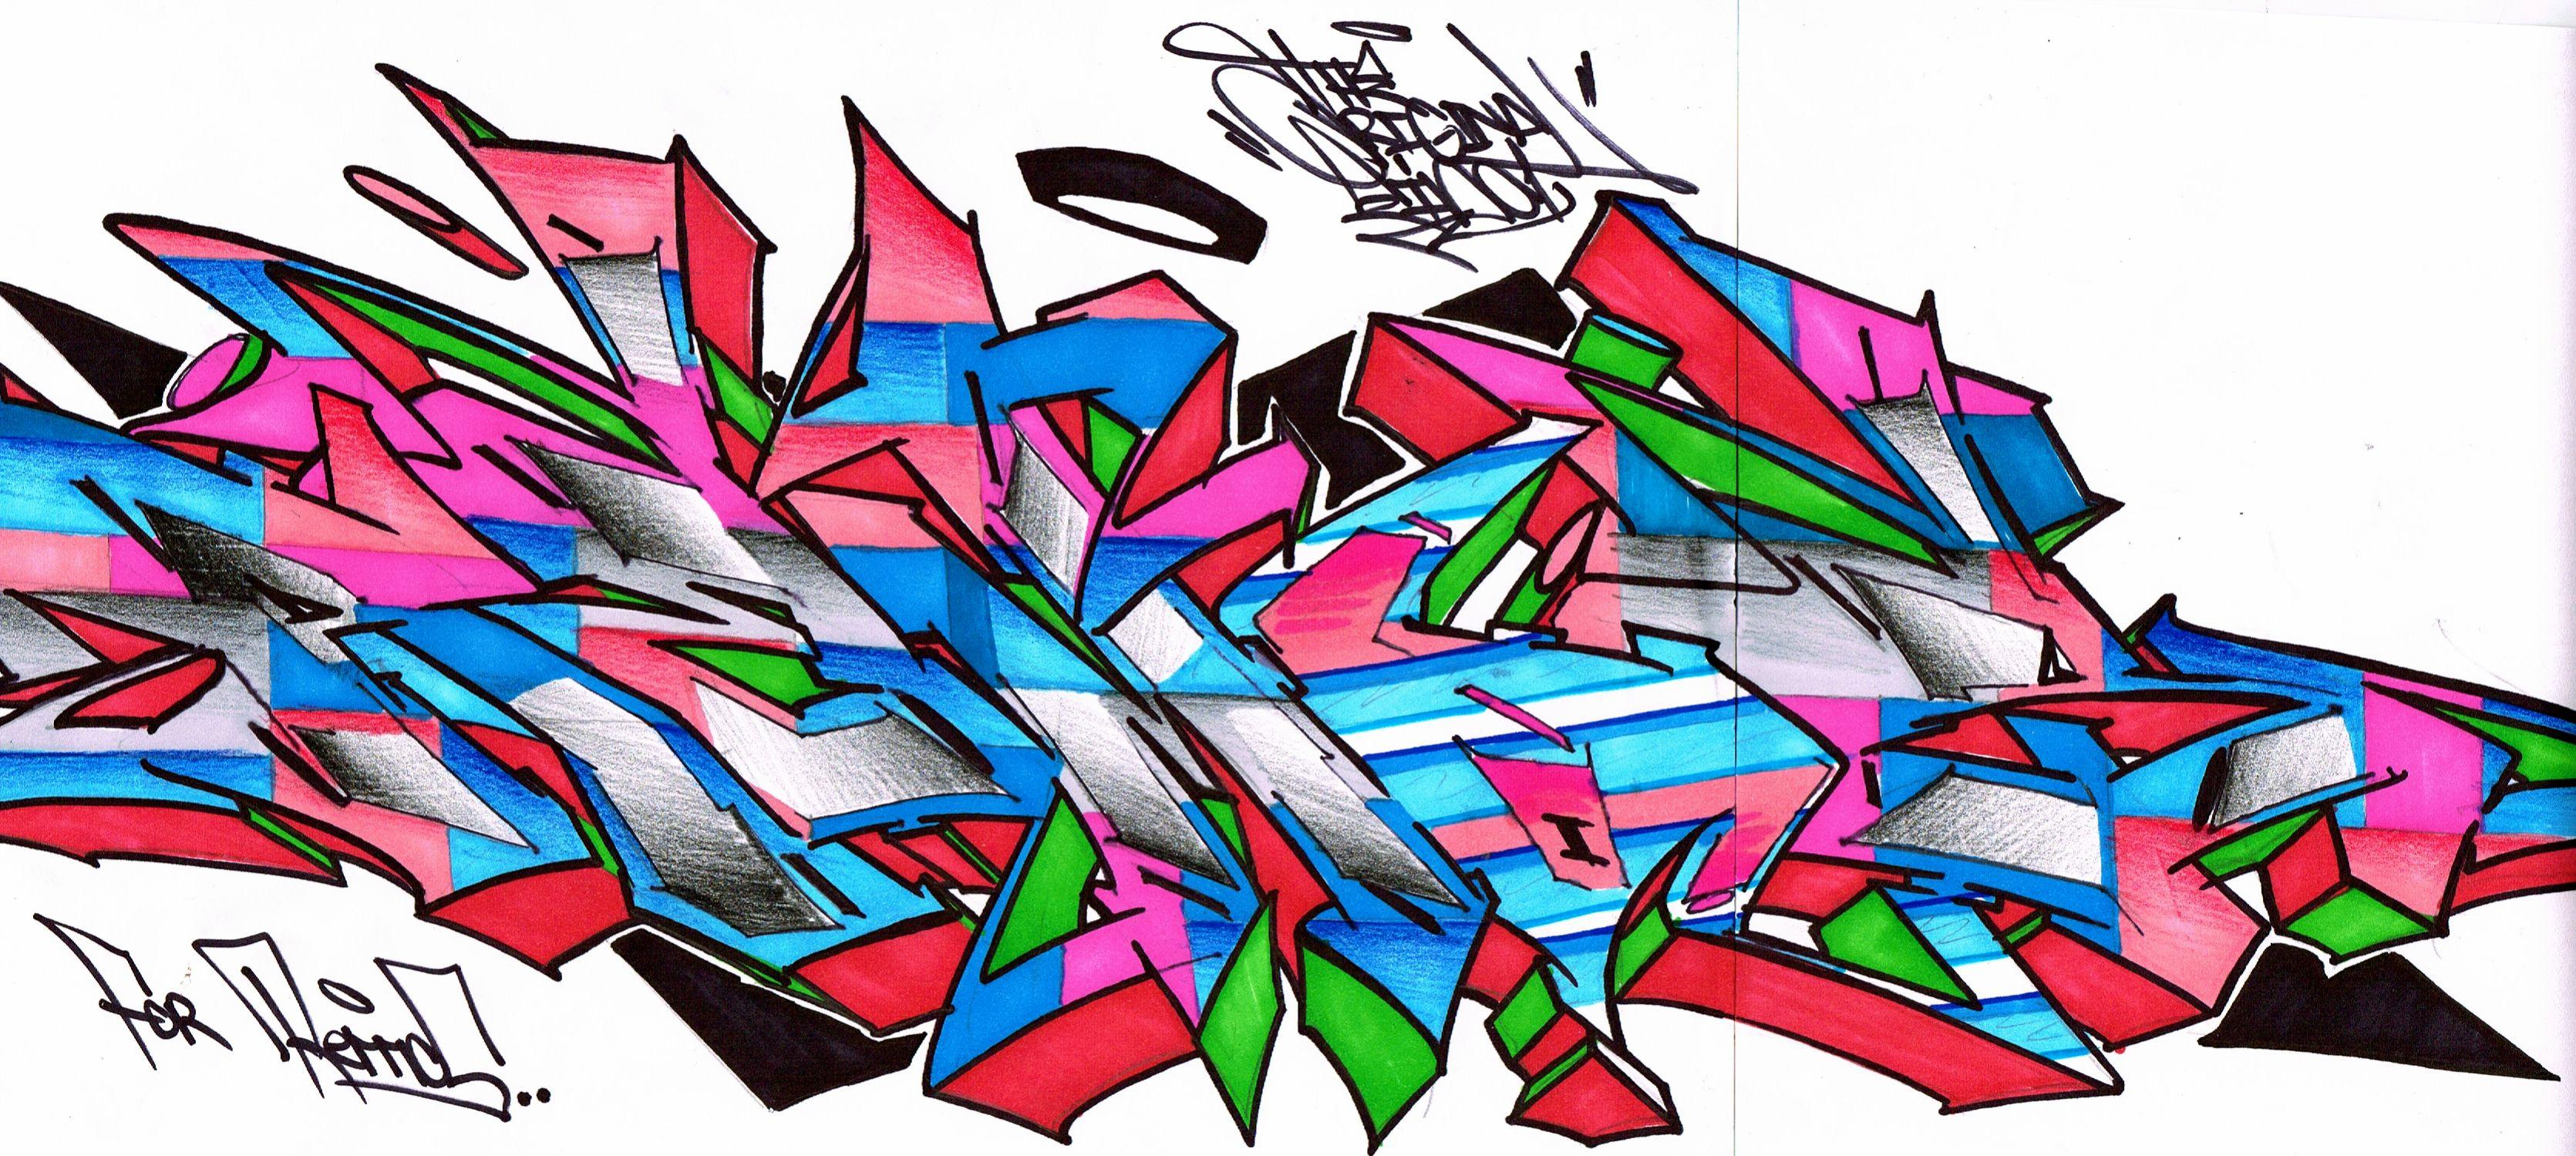 ai.imgur.com_NVMGR2q.jpg